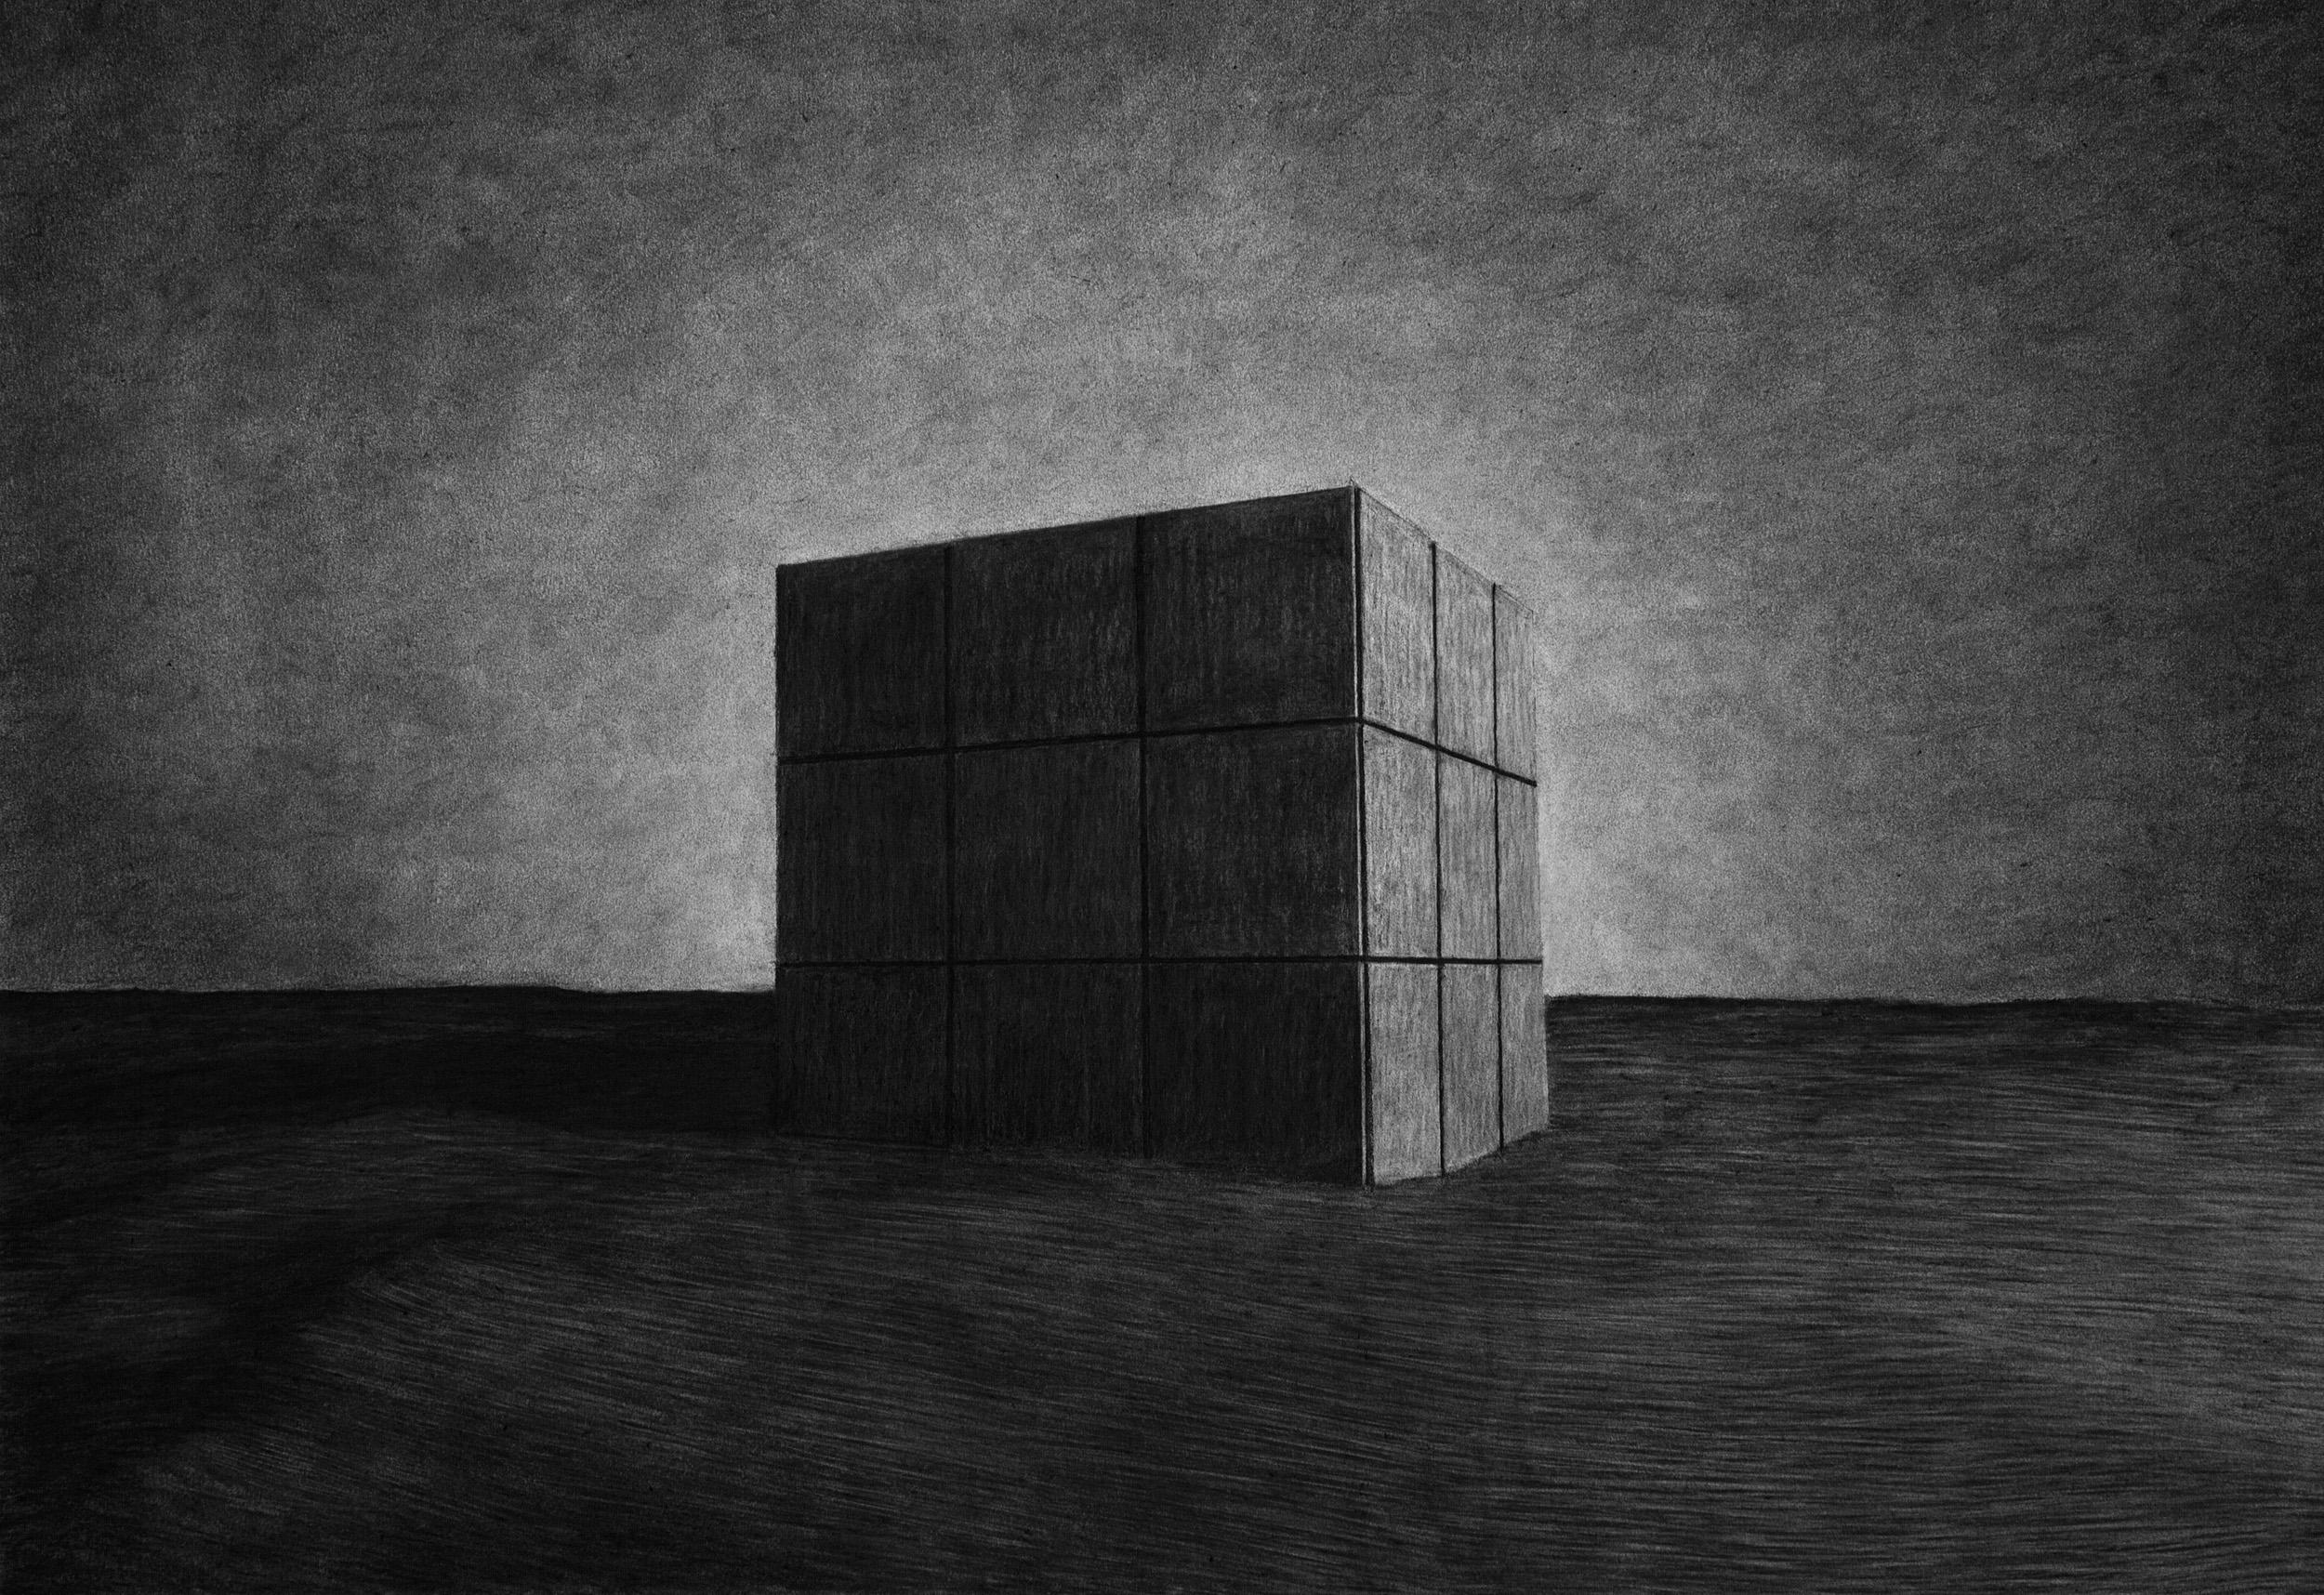 Charcoal drawing | 2016 | 73 x 51 cm